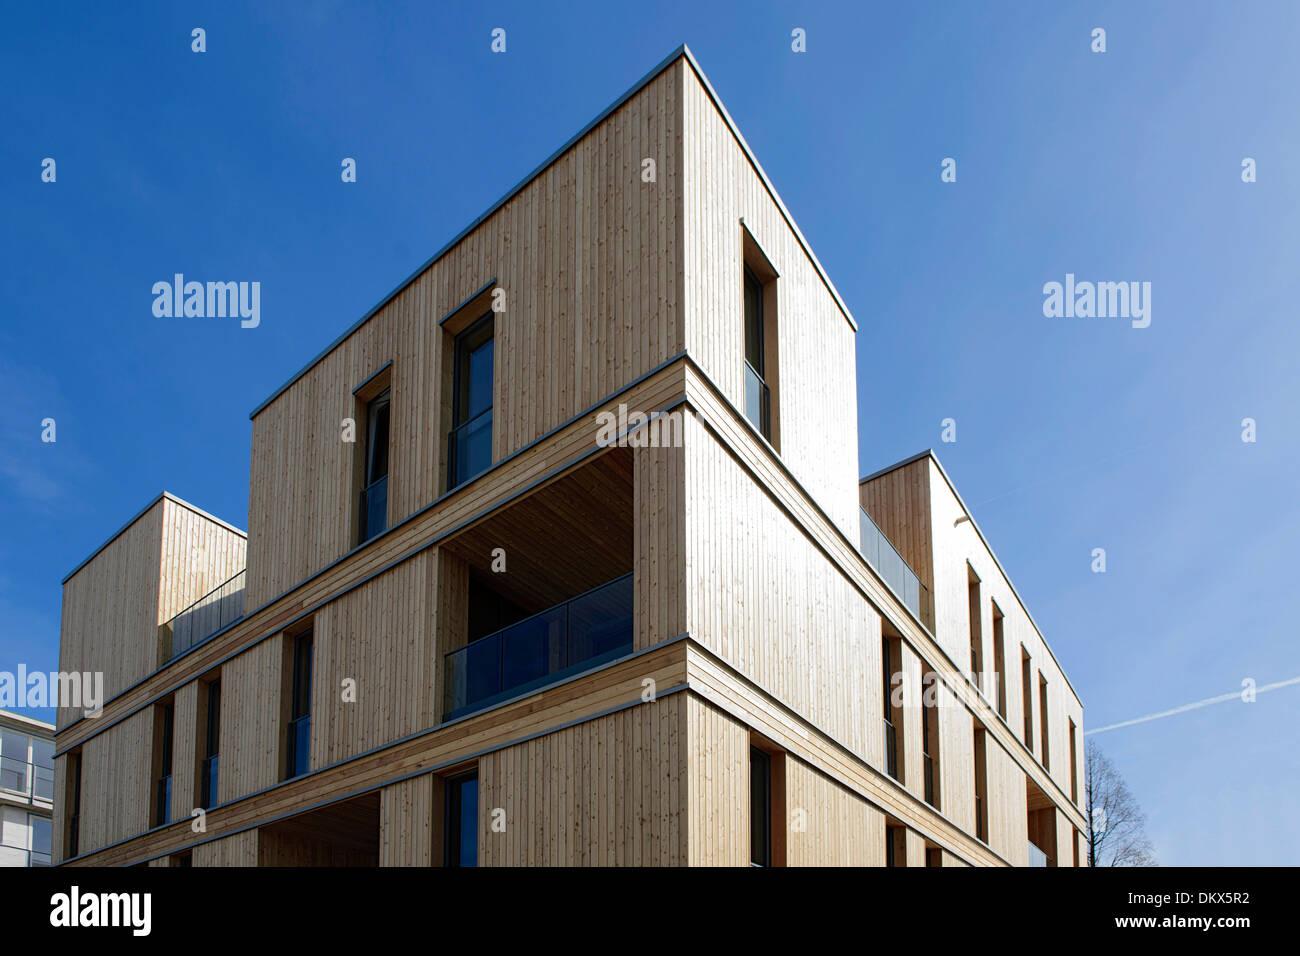 haus mit preis free gro davinci haus preis kleymann lopez with haus mit preis fabulous hanse. Black Bedroom Furniture Sets. Home Design Ideas